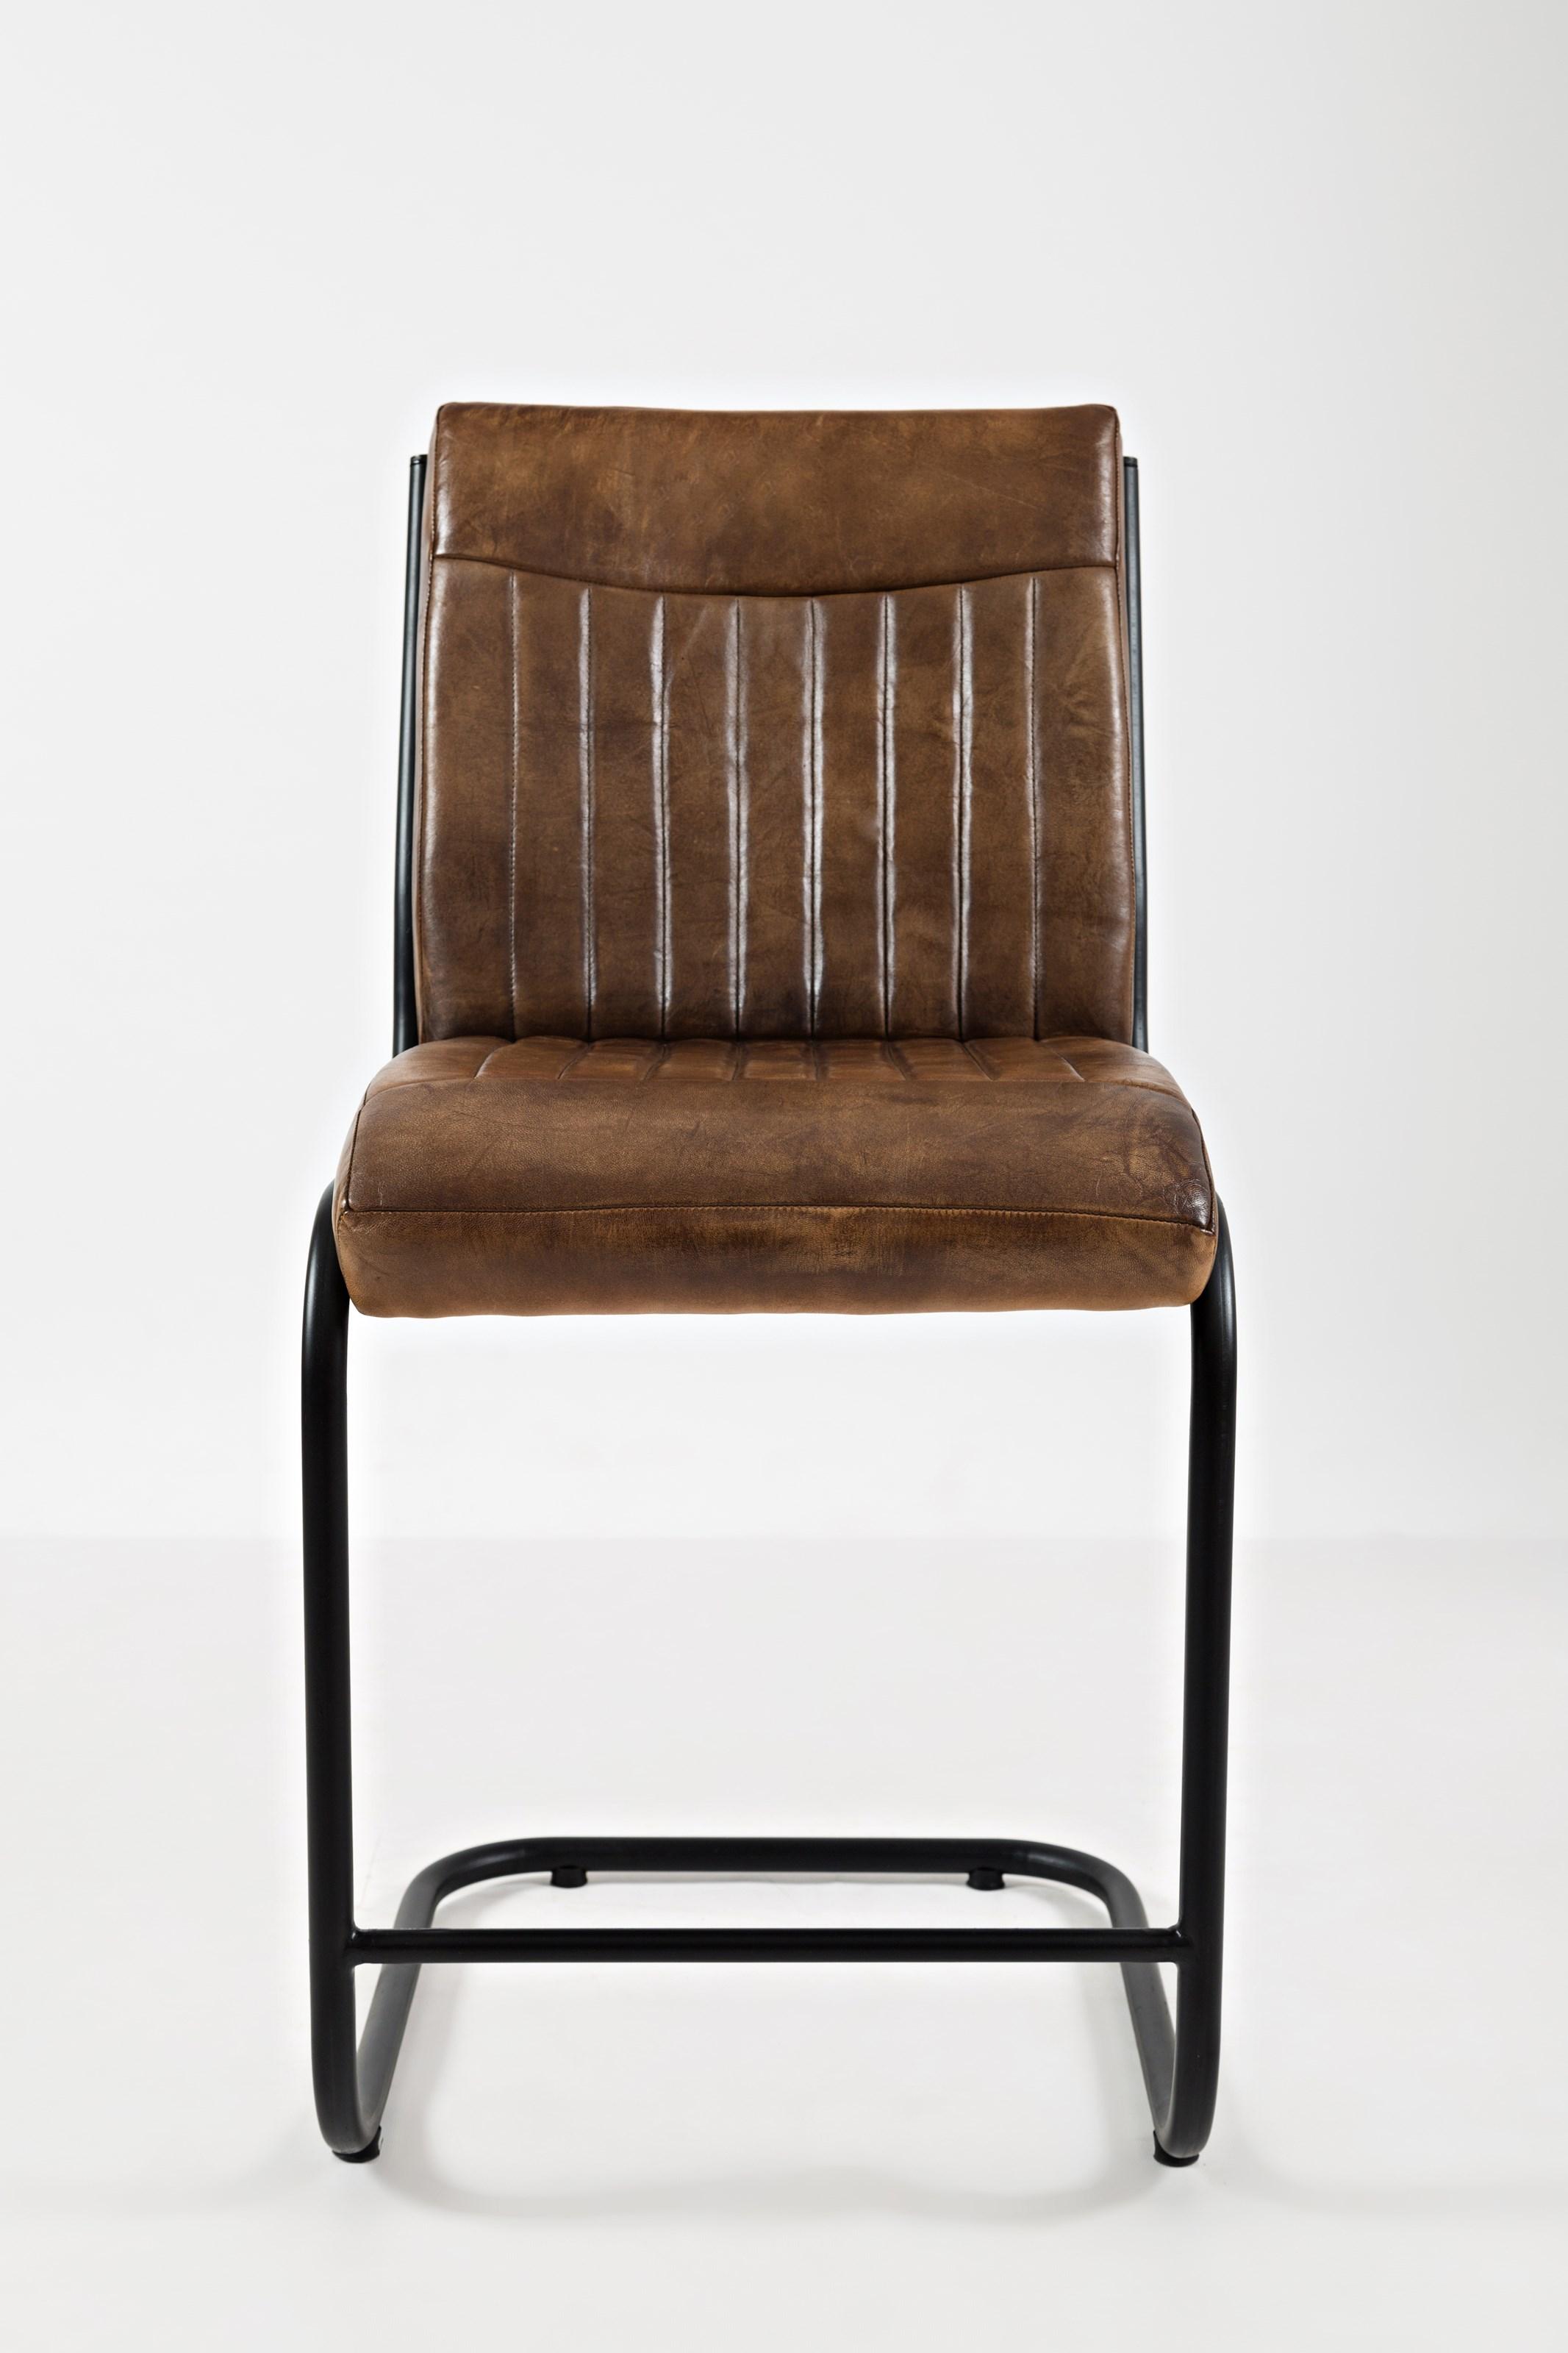 Studio 16 Aviator Stool by Jofran at Stoney Creek Furniture